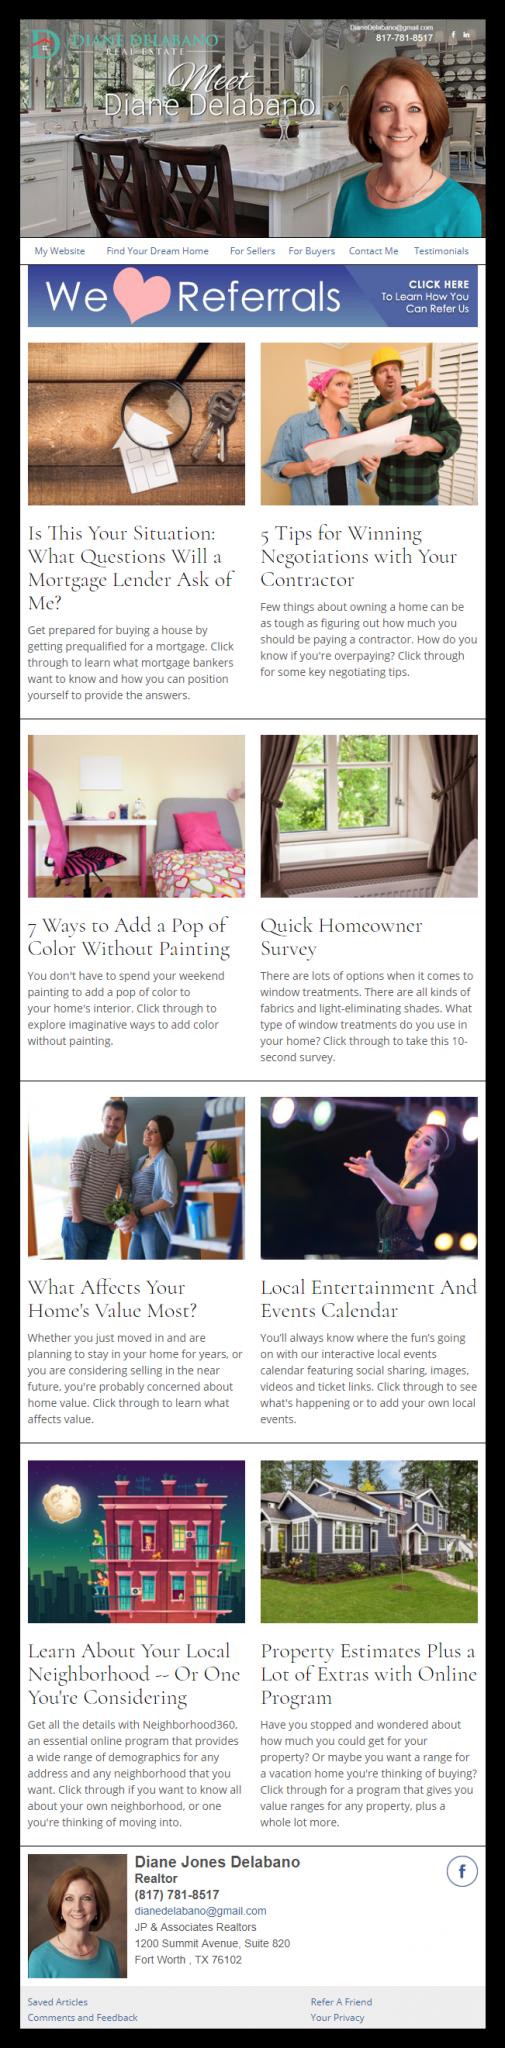 Diane Delabano Real Estate - HomeActions Sample Email Newsletter